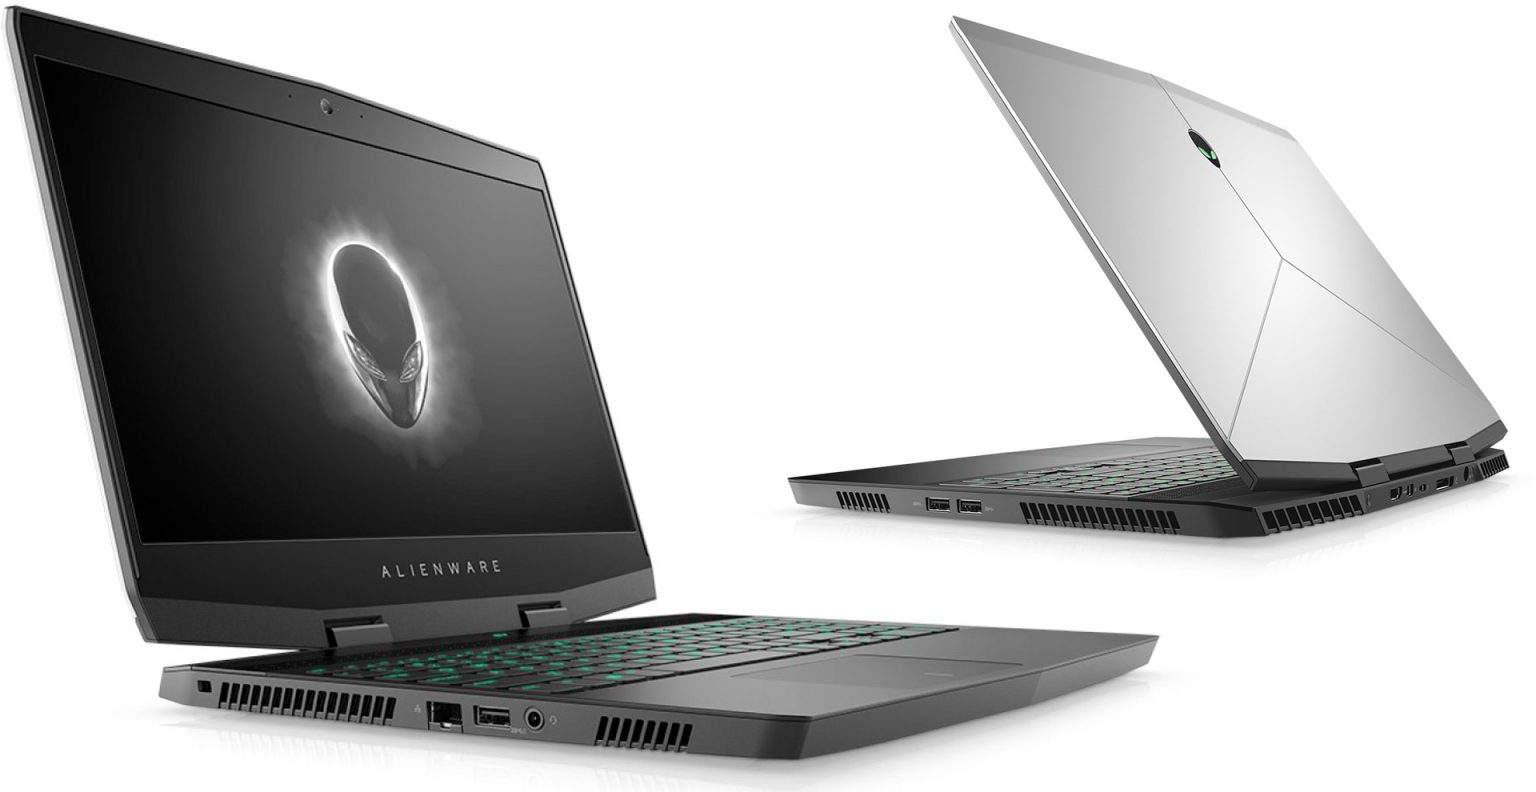 Купить Ноутбук Dell Alienware M15 (M15-5522) фото 3